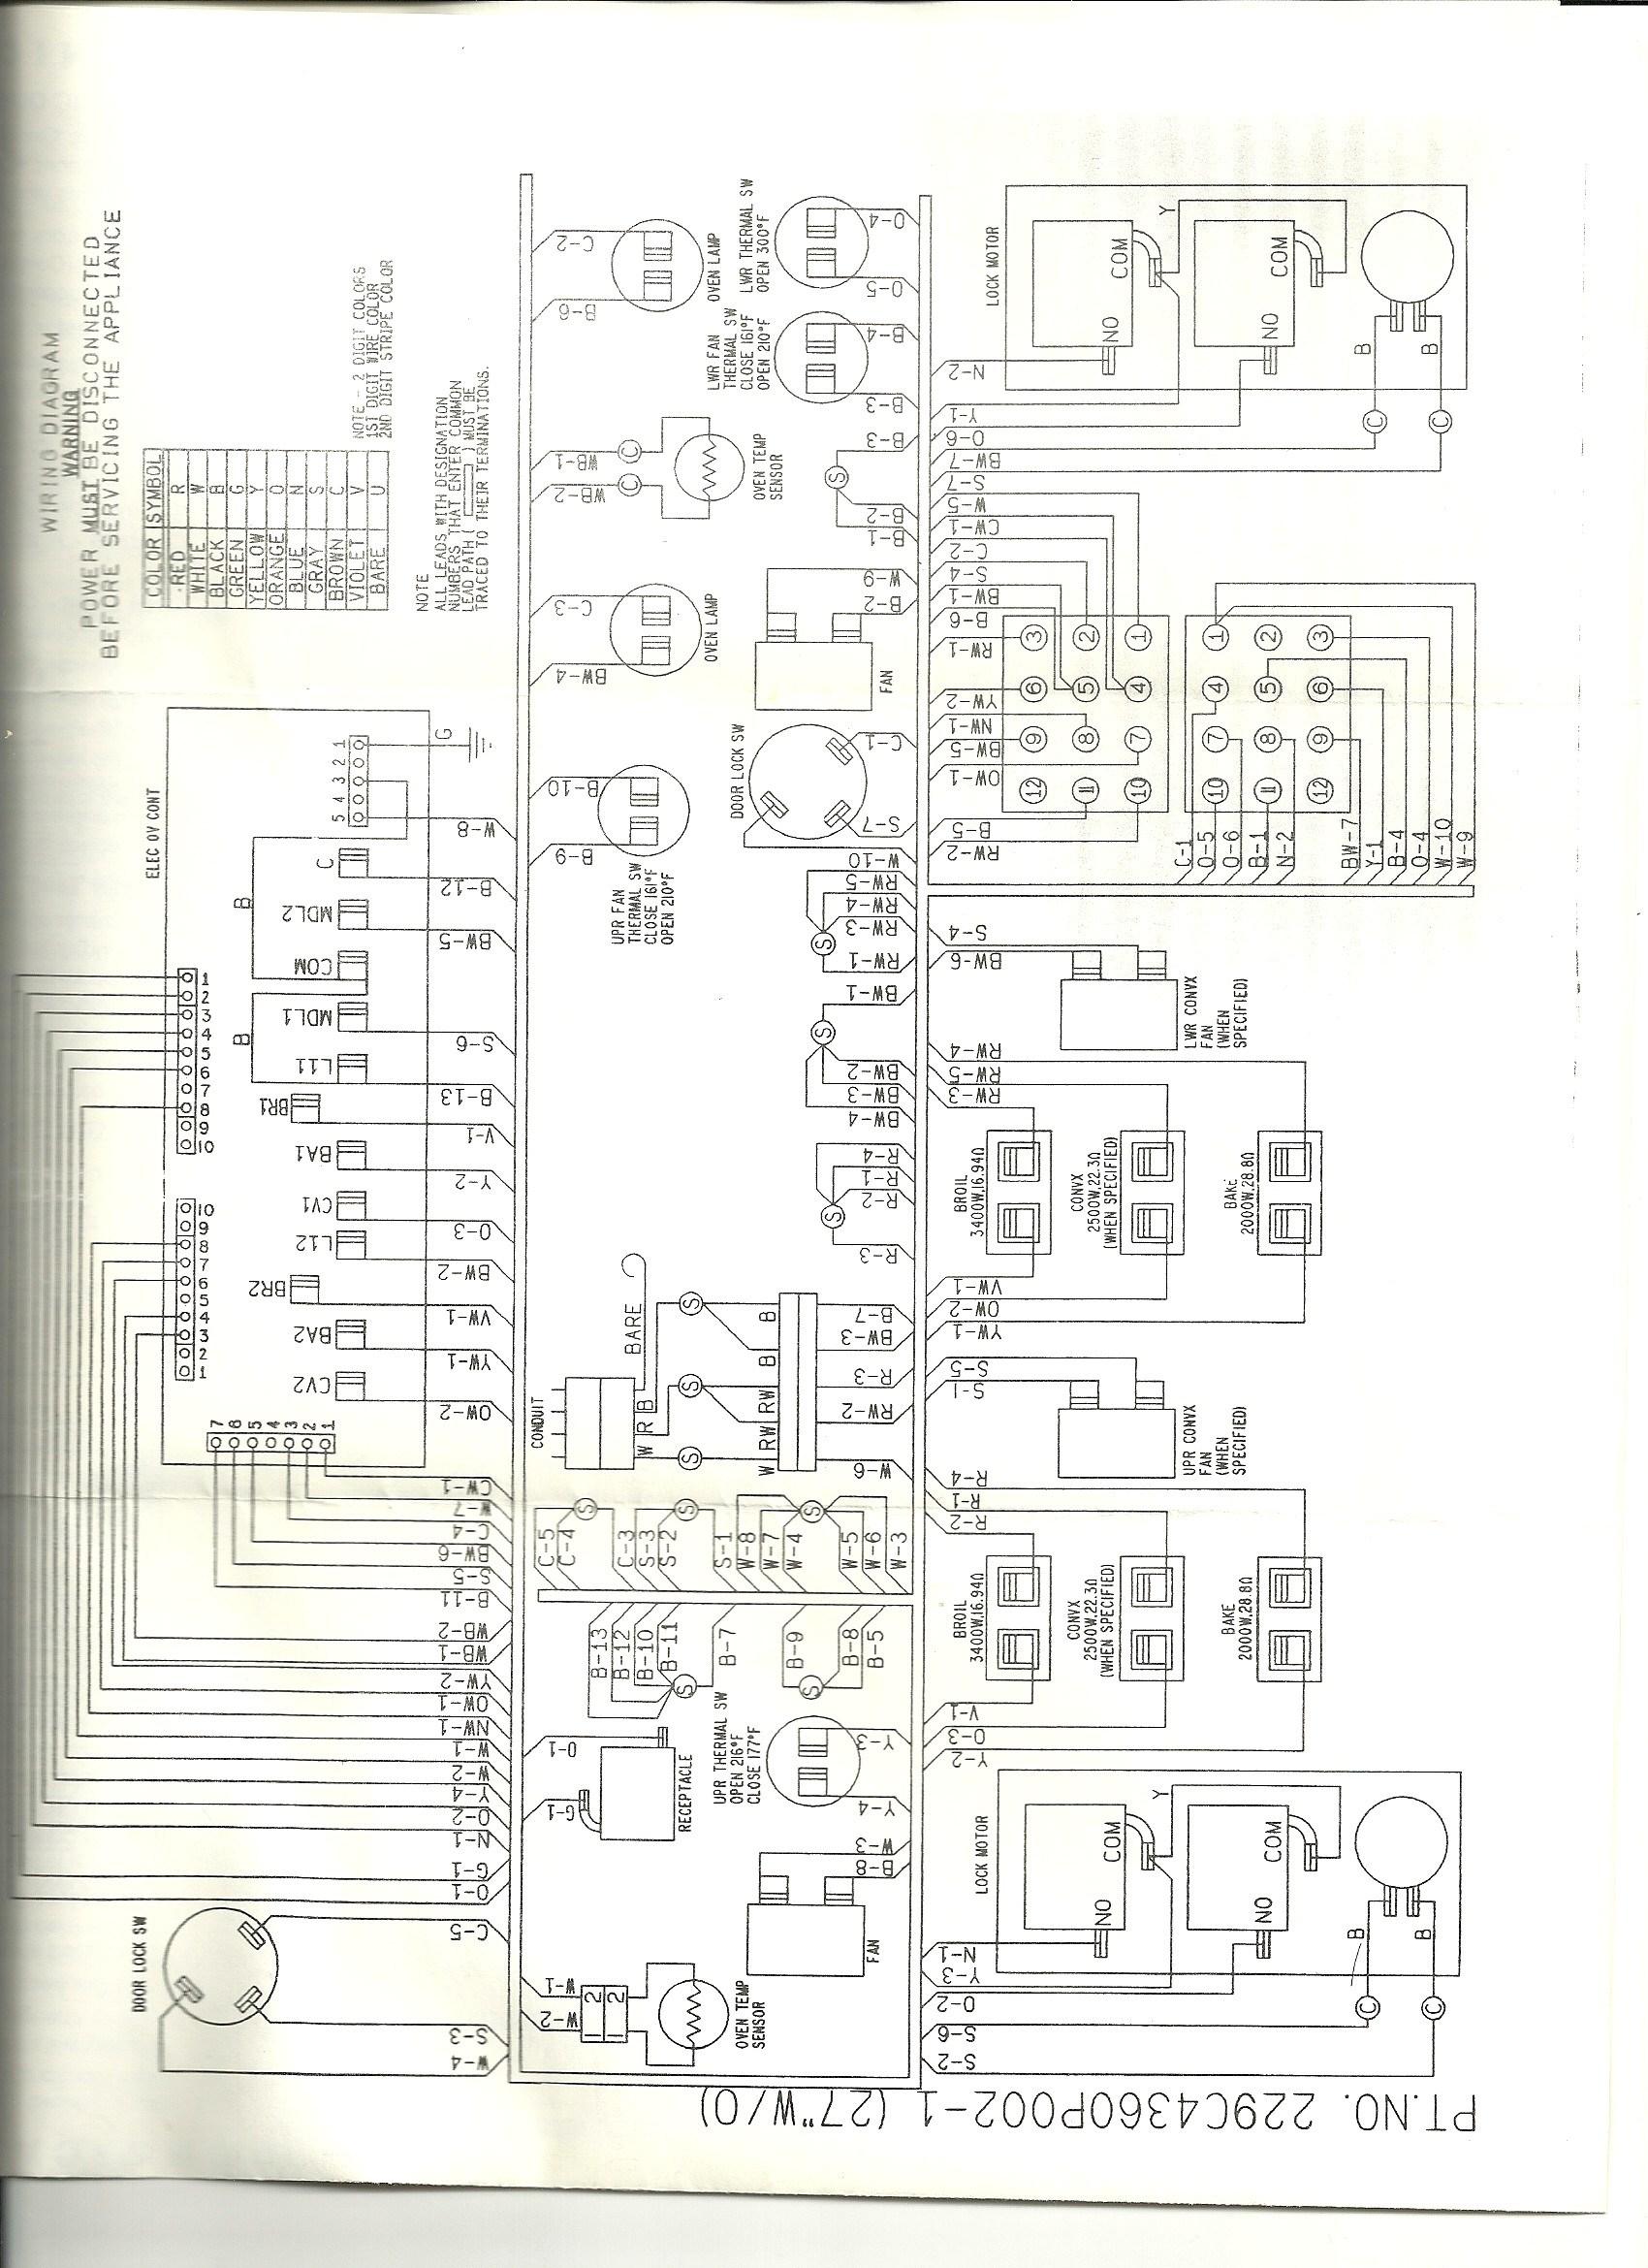 Ge Oven Wiring Diagram Jsp28gop3bg - Wiring Diagram 2005 Dodge Laramie Seat  - stereoa.losdol2-lanjut.jeanjaures37.fr | Ge Oven Wiring Diagram Jsp28gop3bg |  | Wiring Diagram Resource